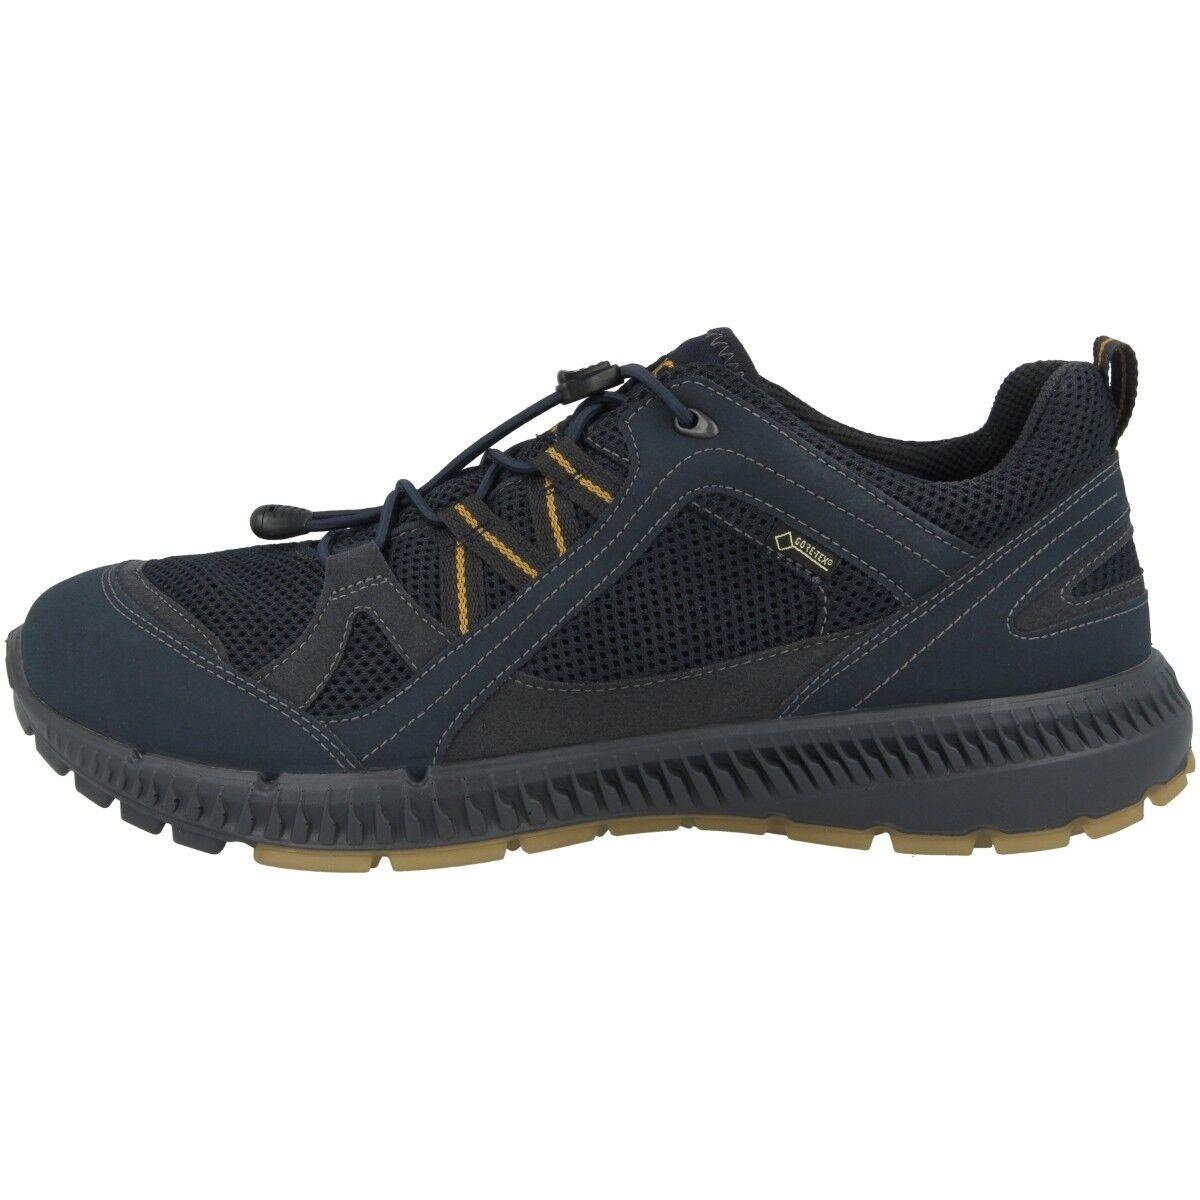 Ecco Terracruise II Pitkin GTX Men Trekking Herren Outdoor Schuhe 843034-51127